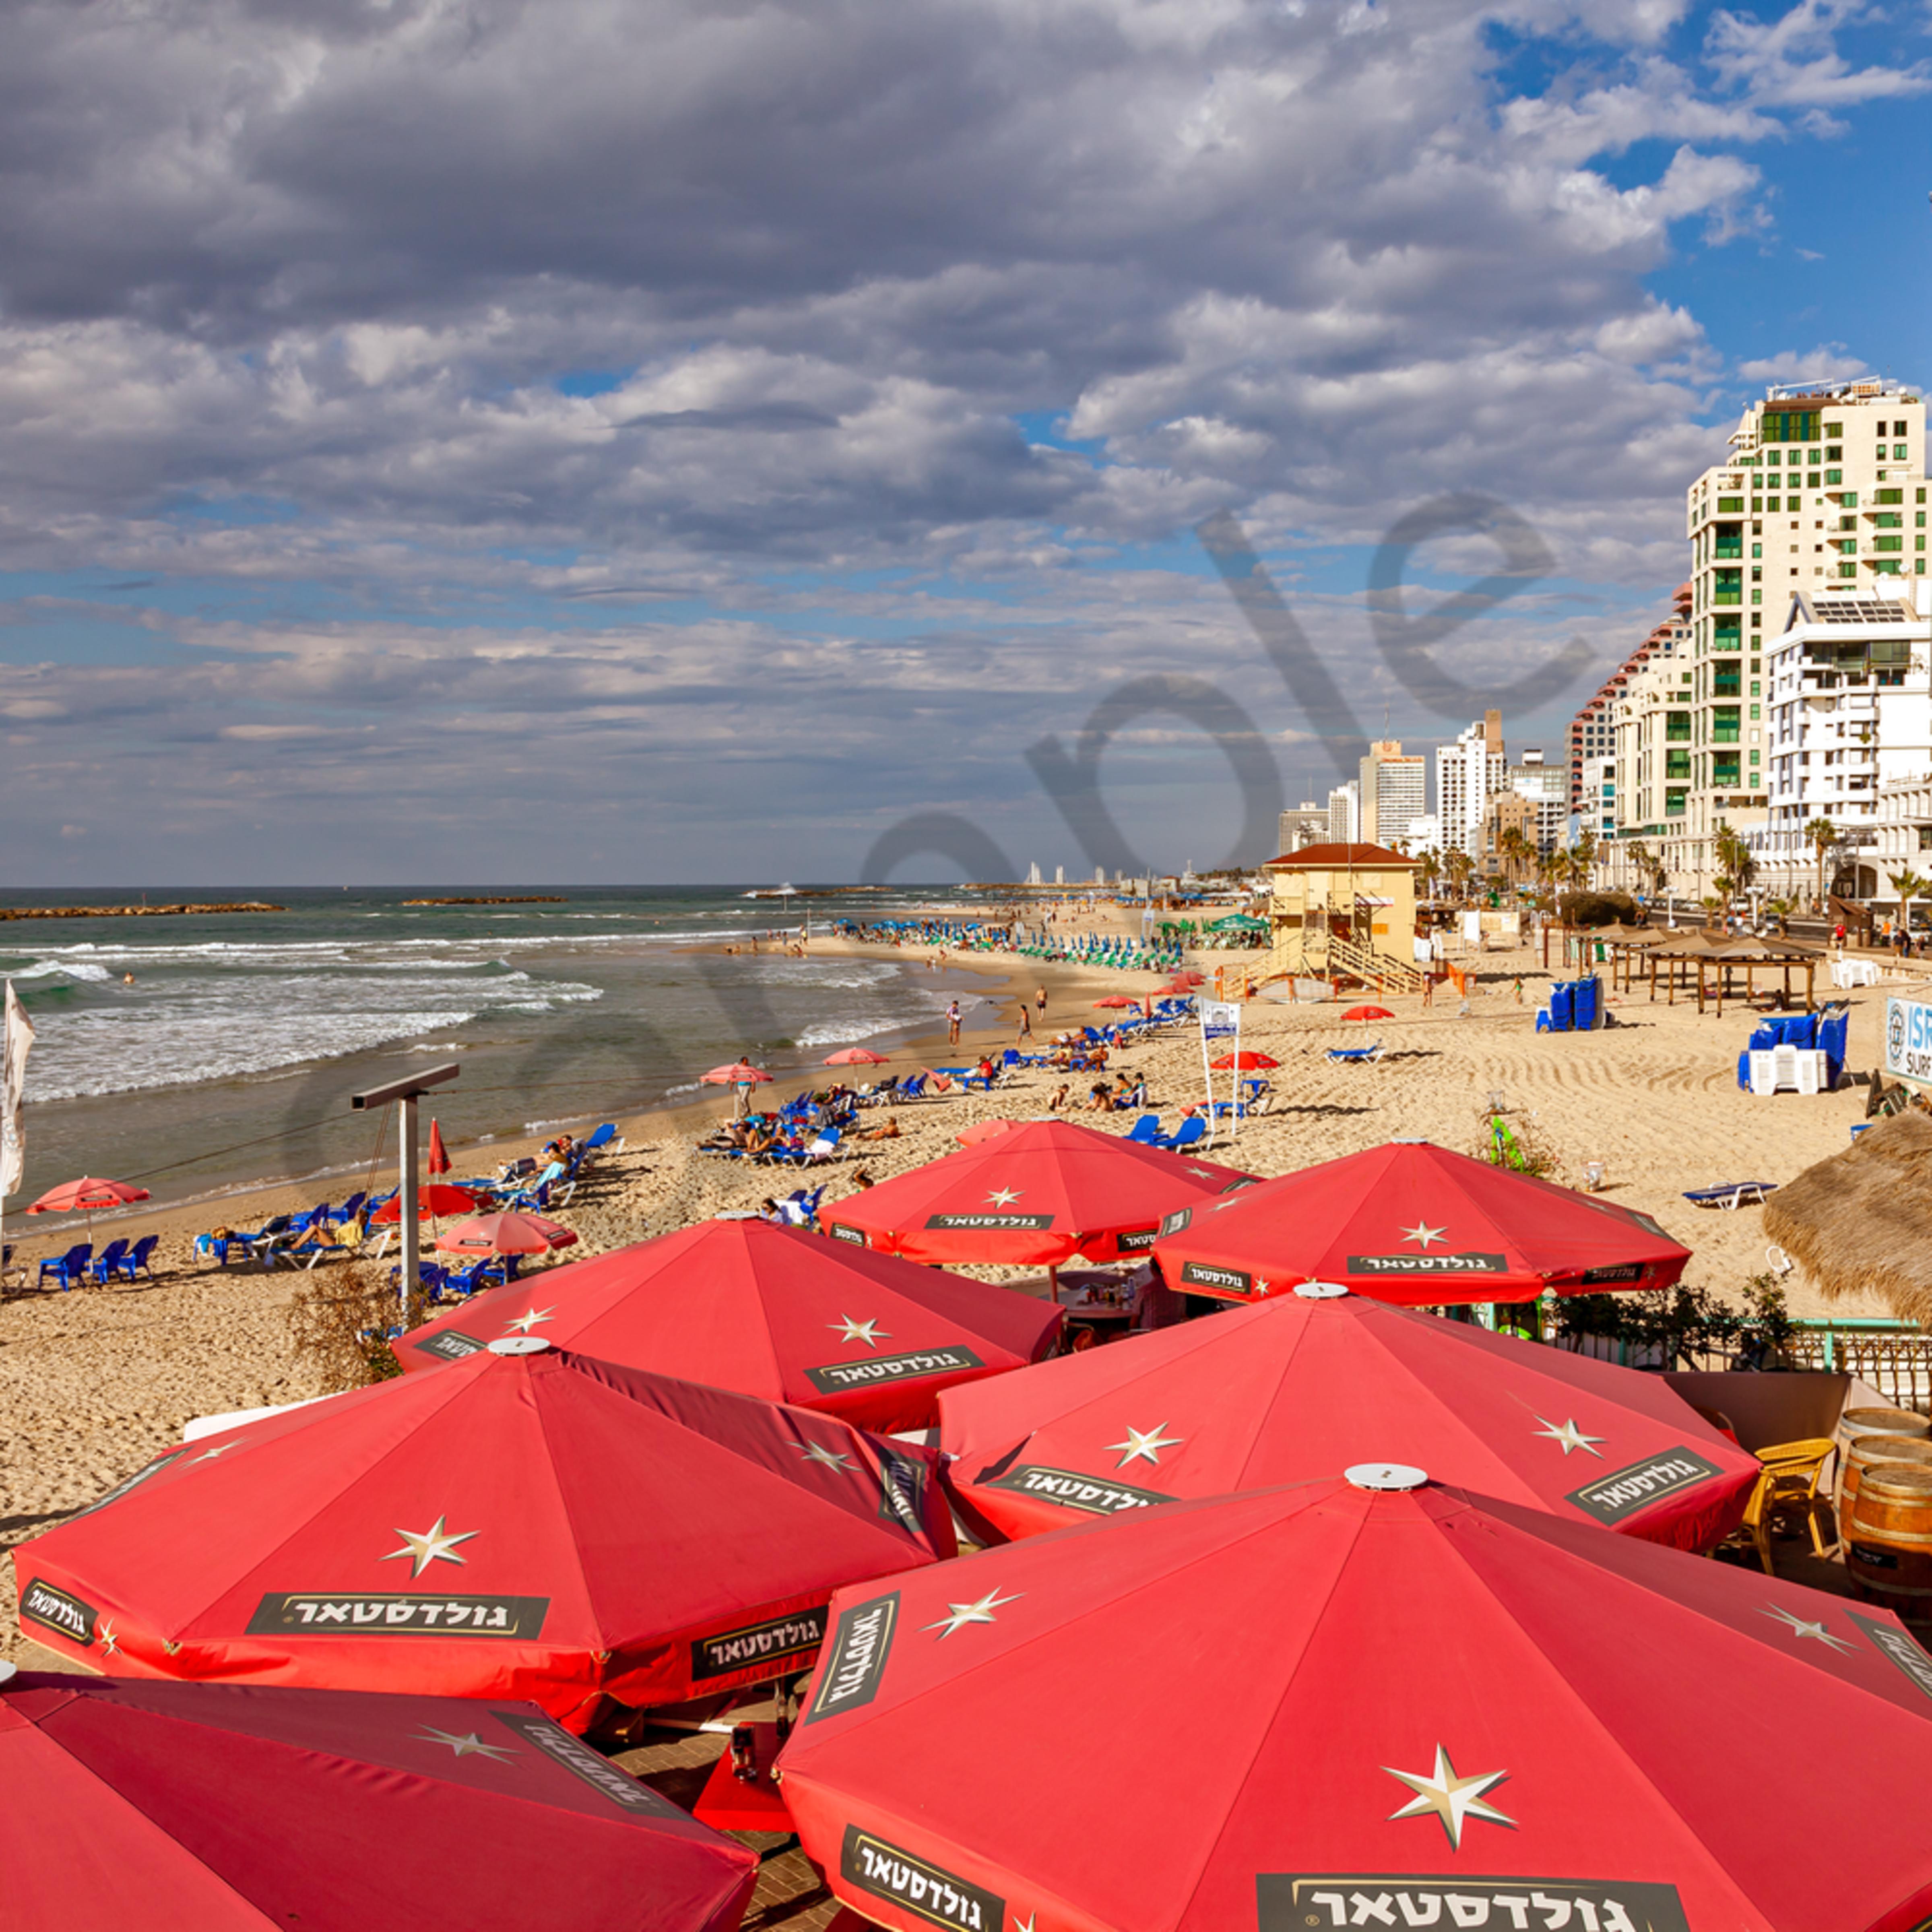 Tel aviv beach israel w6nivu